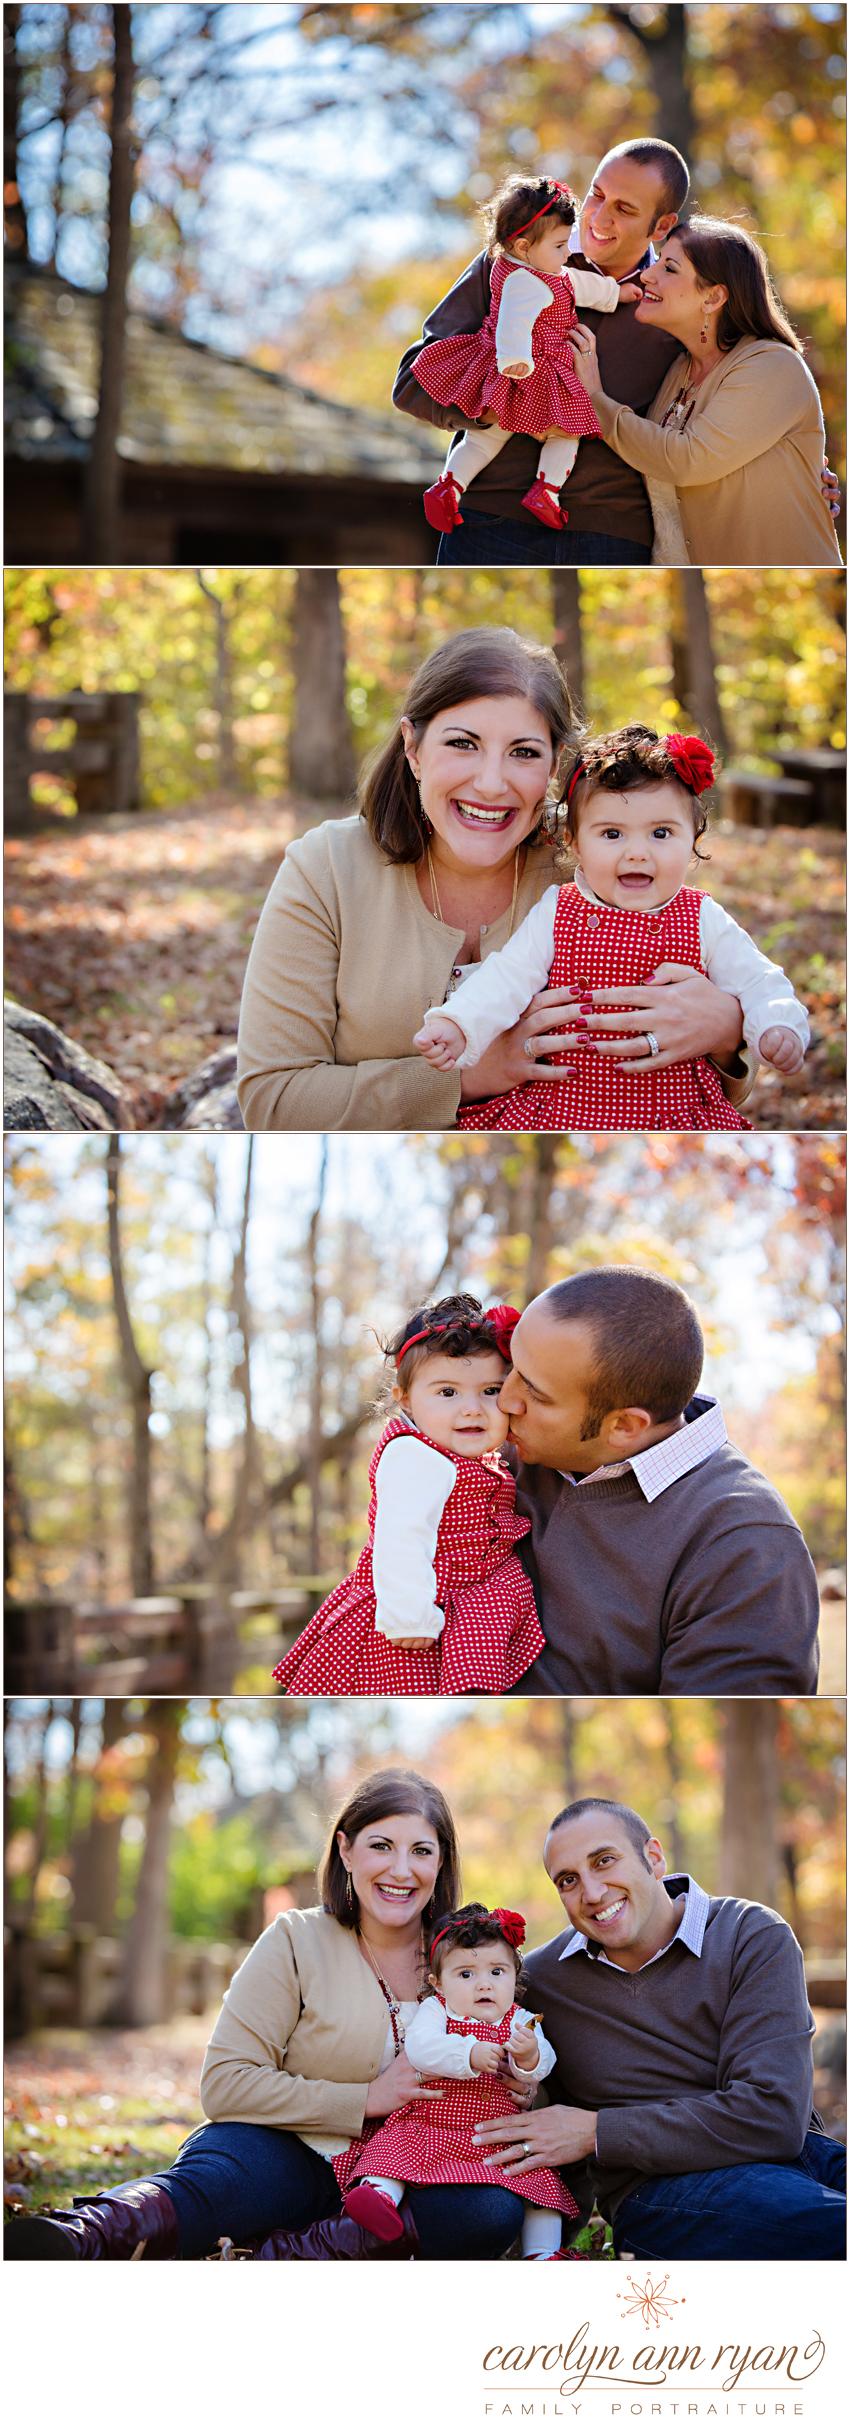 Marvin NC Family Photographer Carolyn Ann Ryan photographs Fall Family Portrait Session